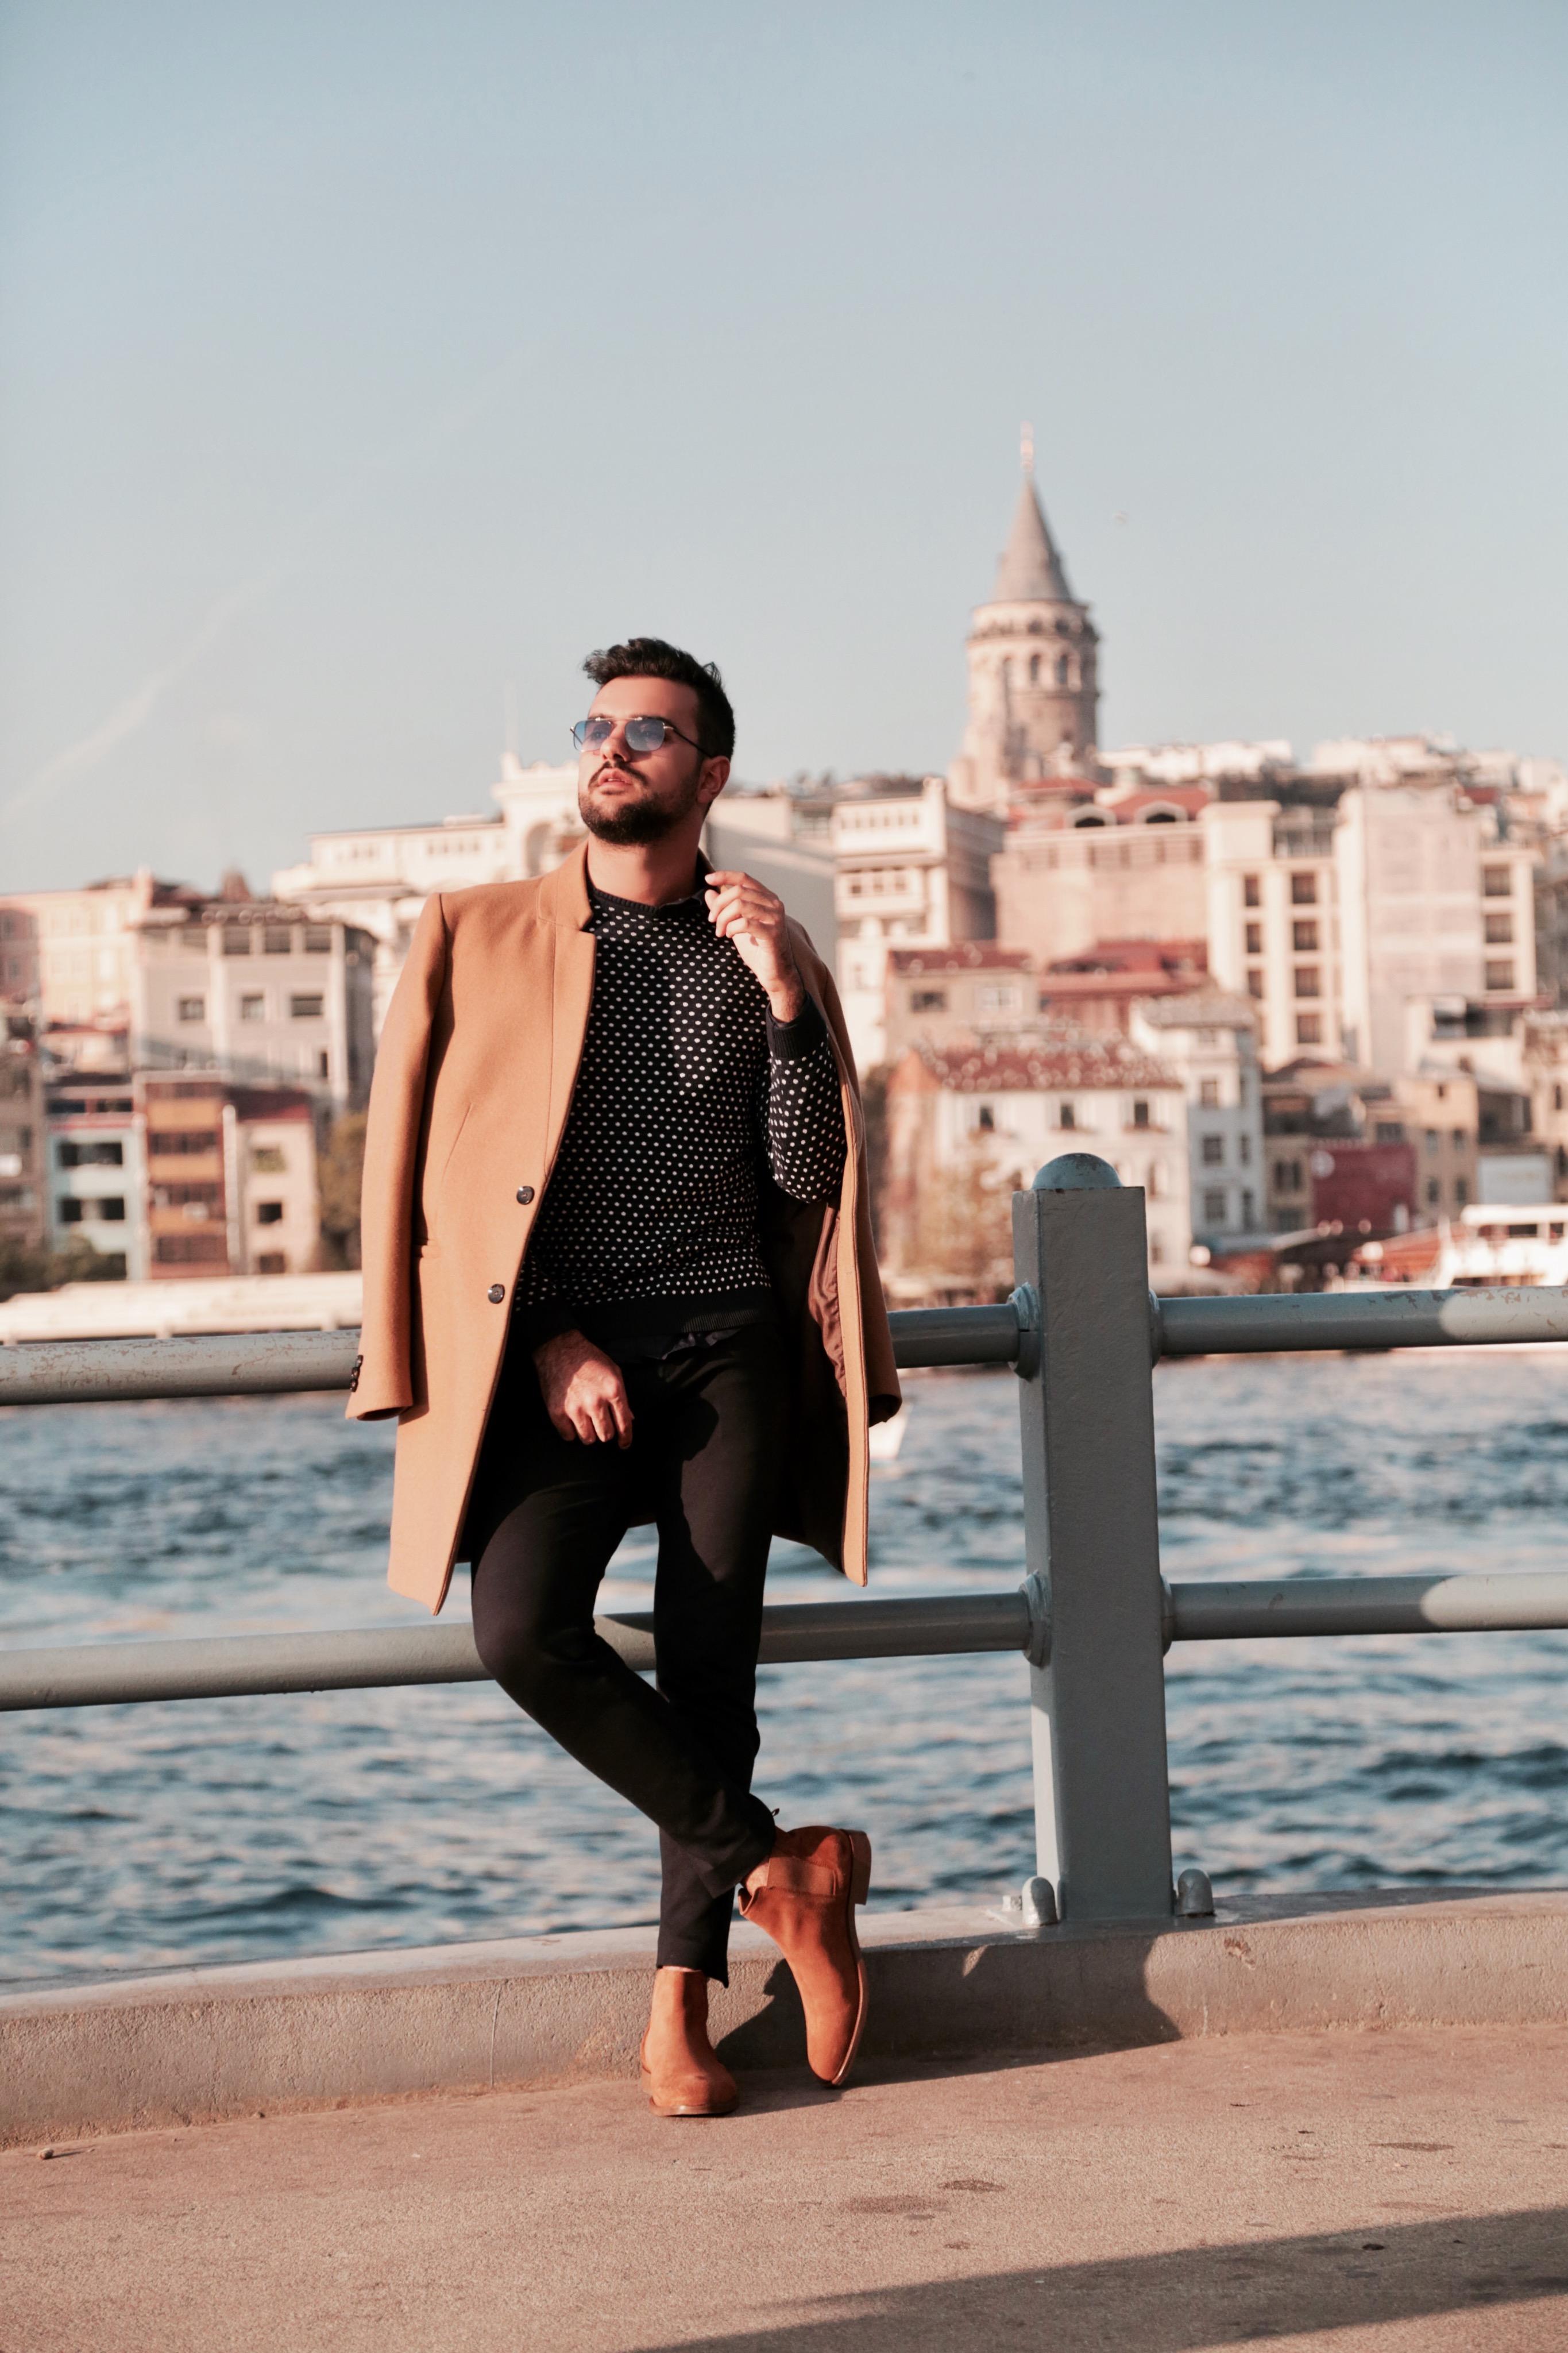 İstanbul Galata Gün batımı kubilay sakarya